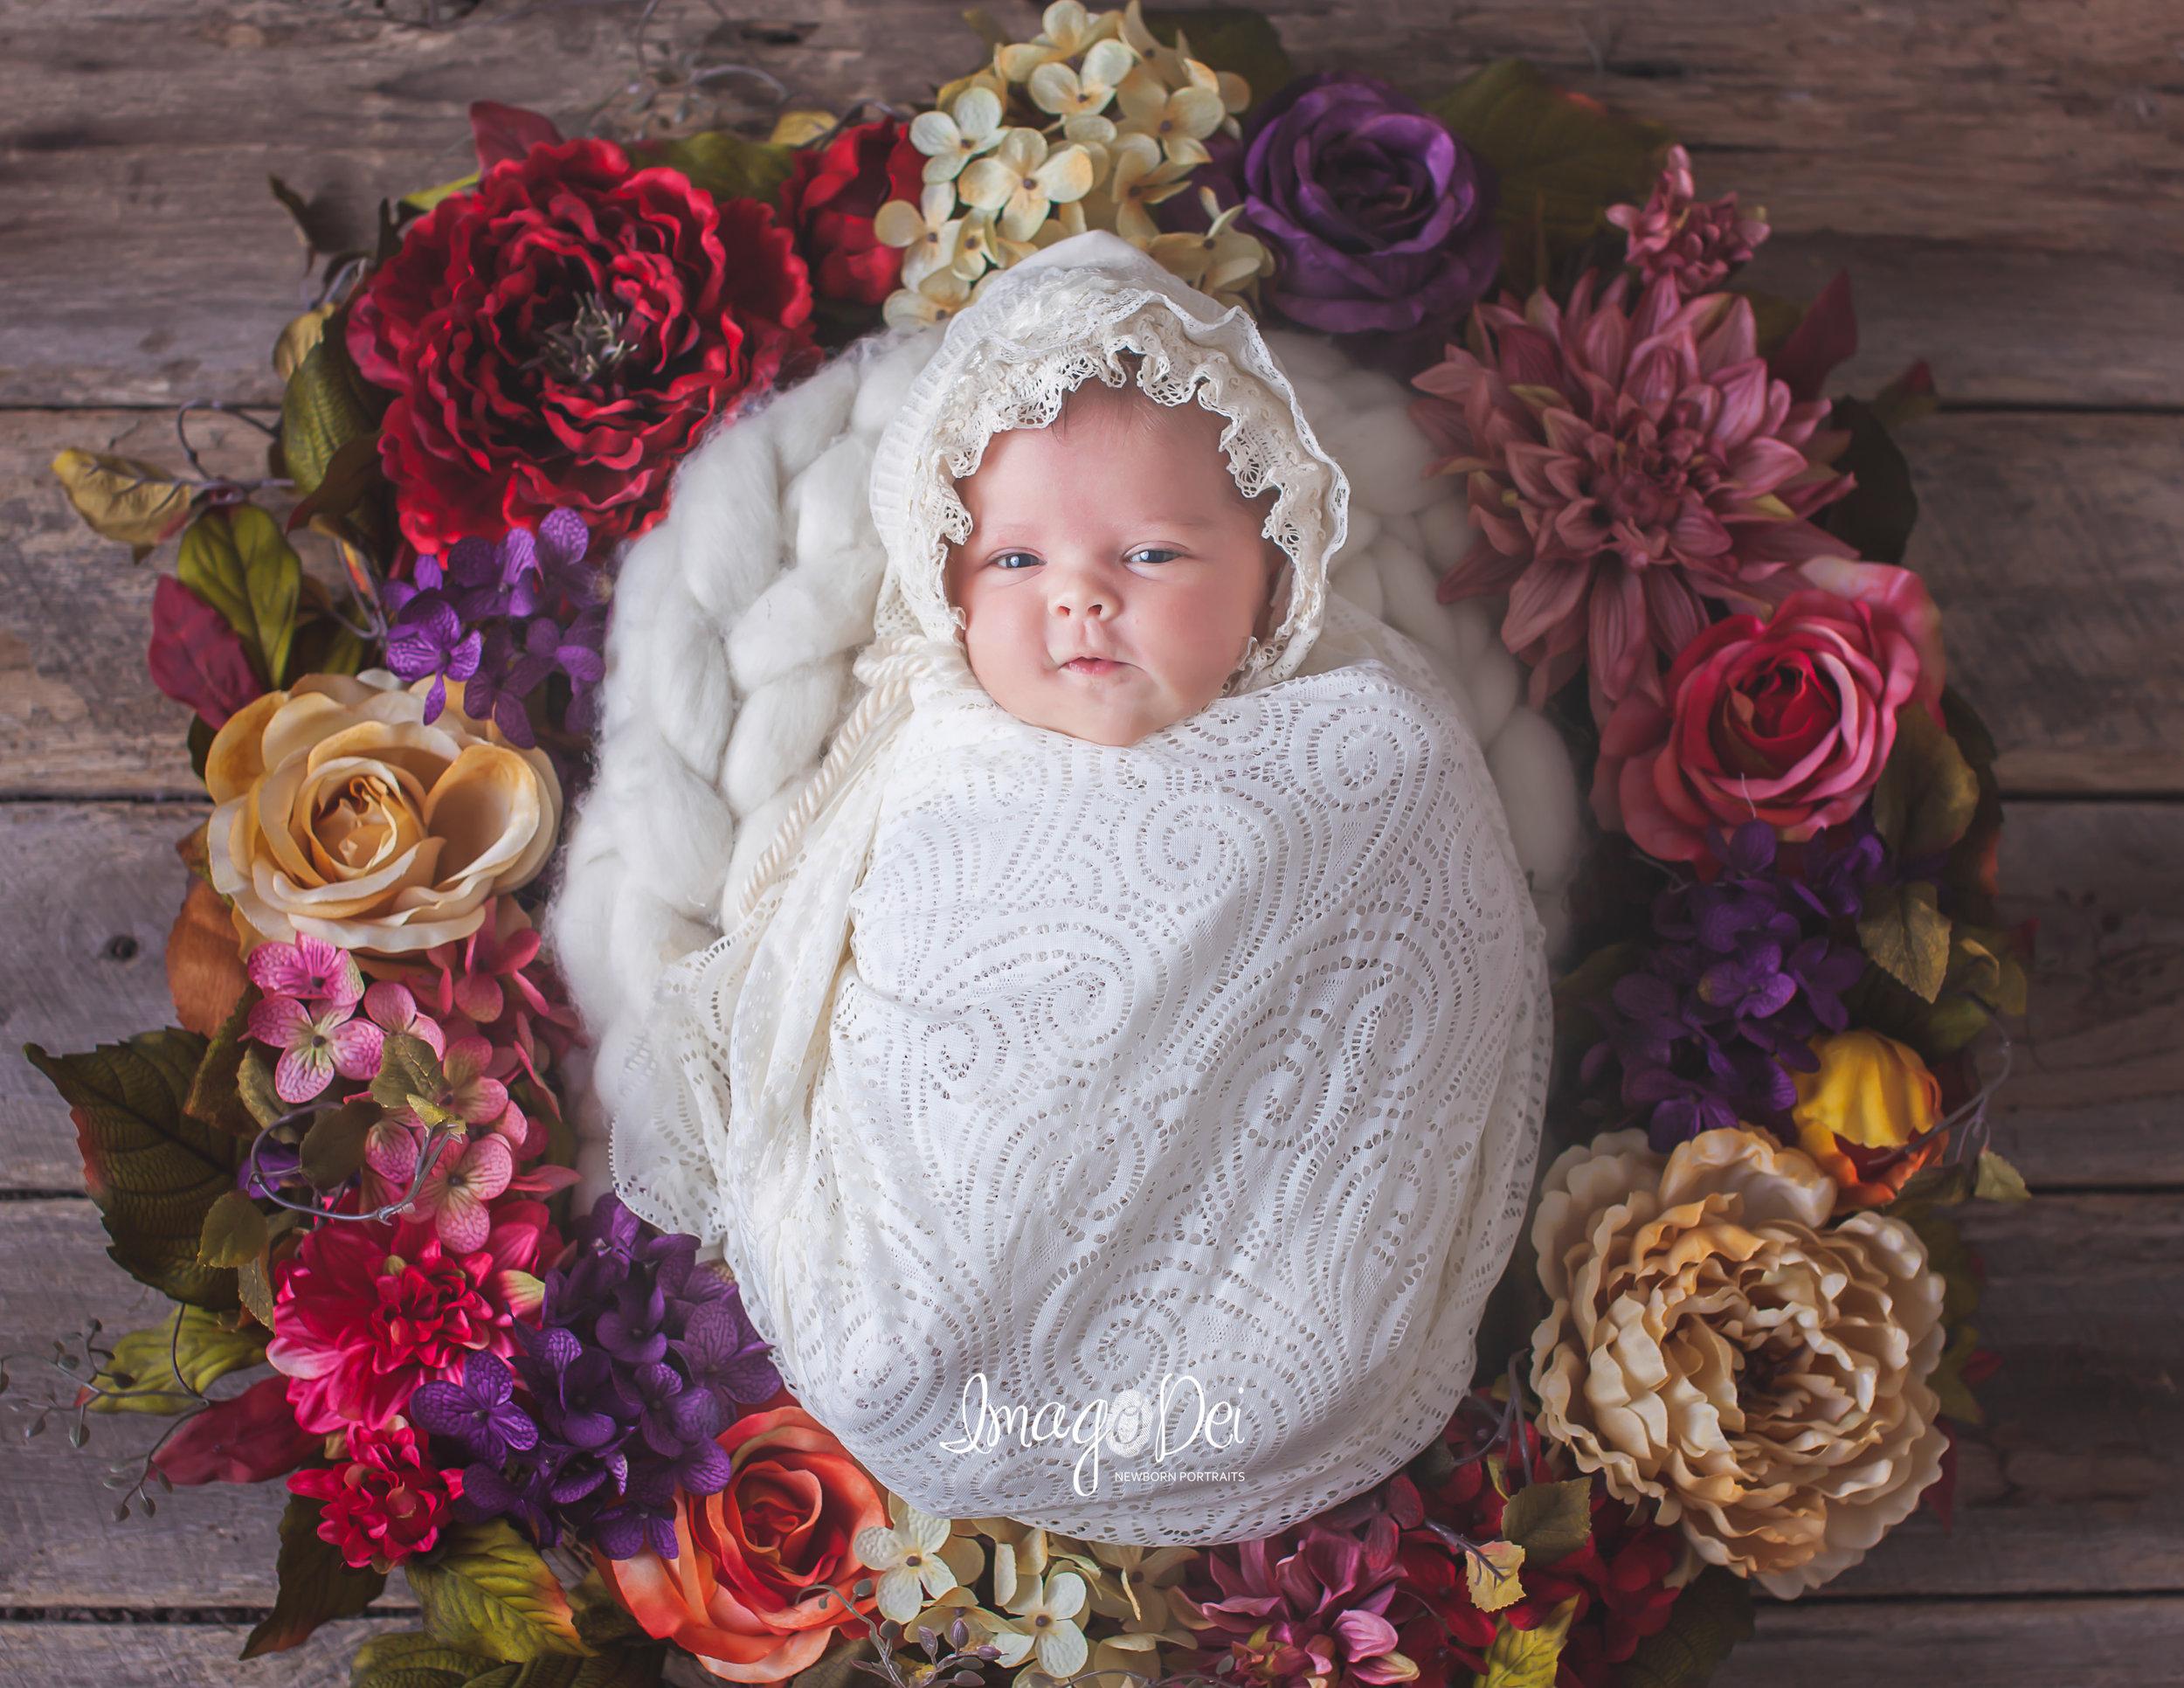 imago-dei-newborn-photography-15